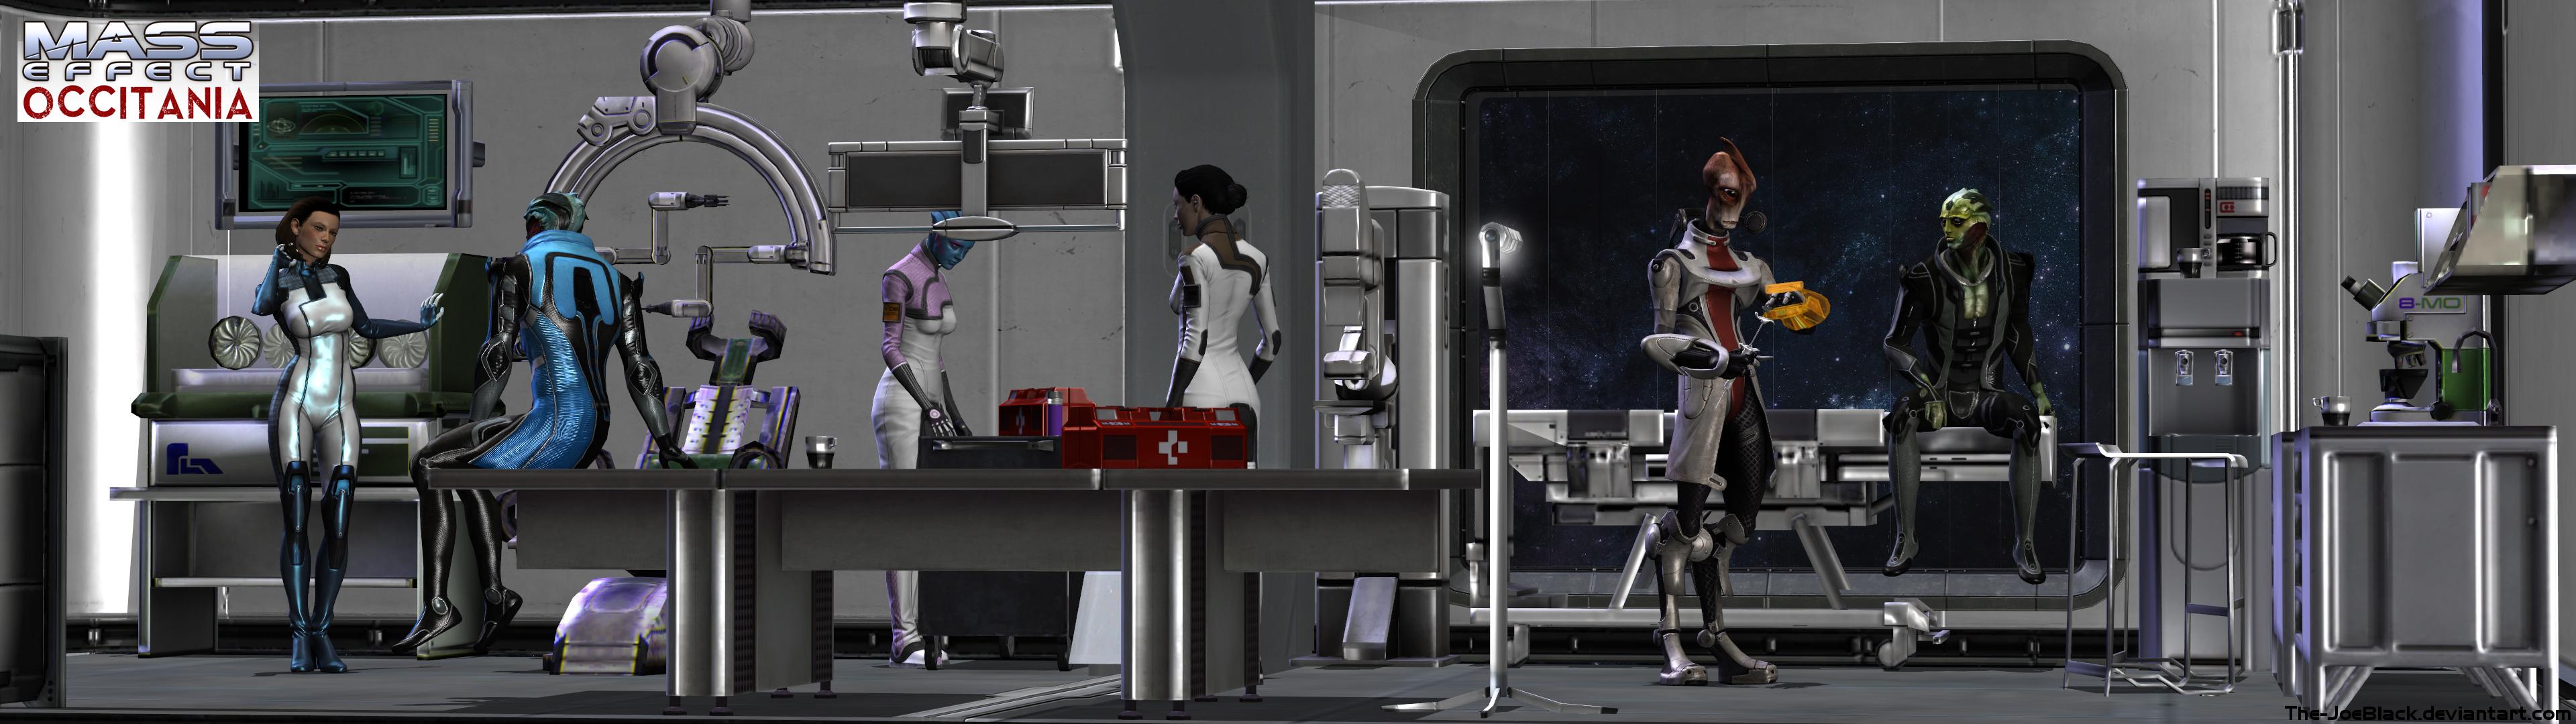 Mass Effect - Occitania: The Medlab by JoesHouseOfArt